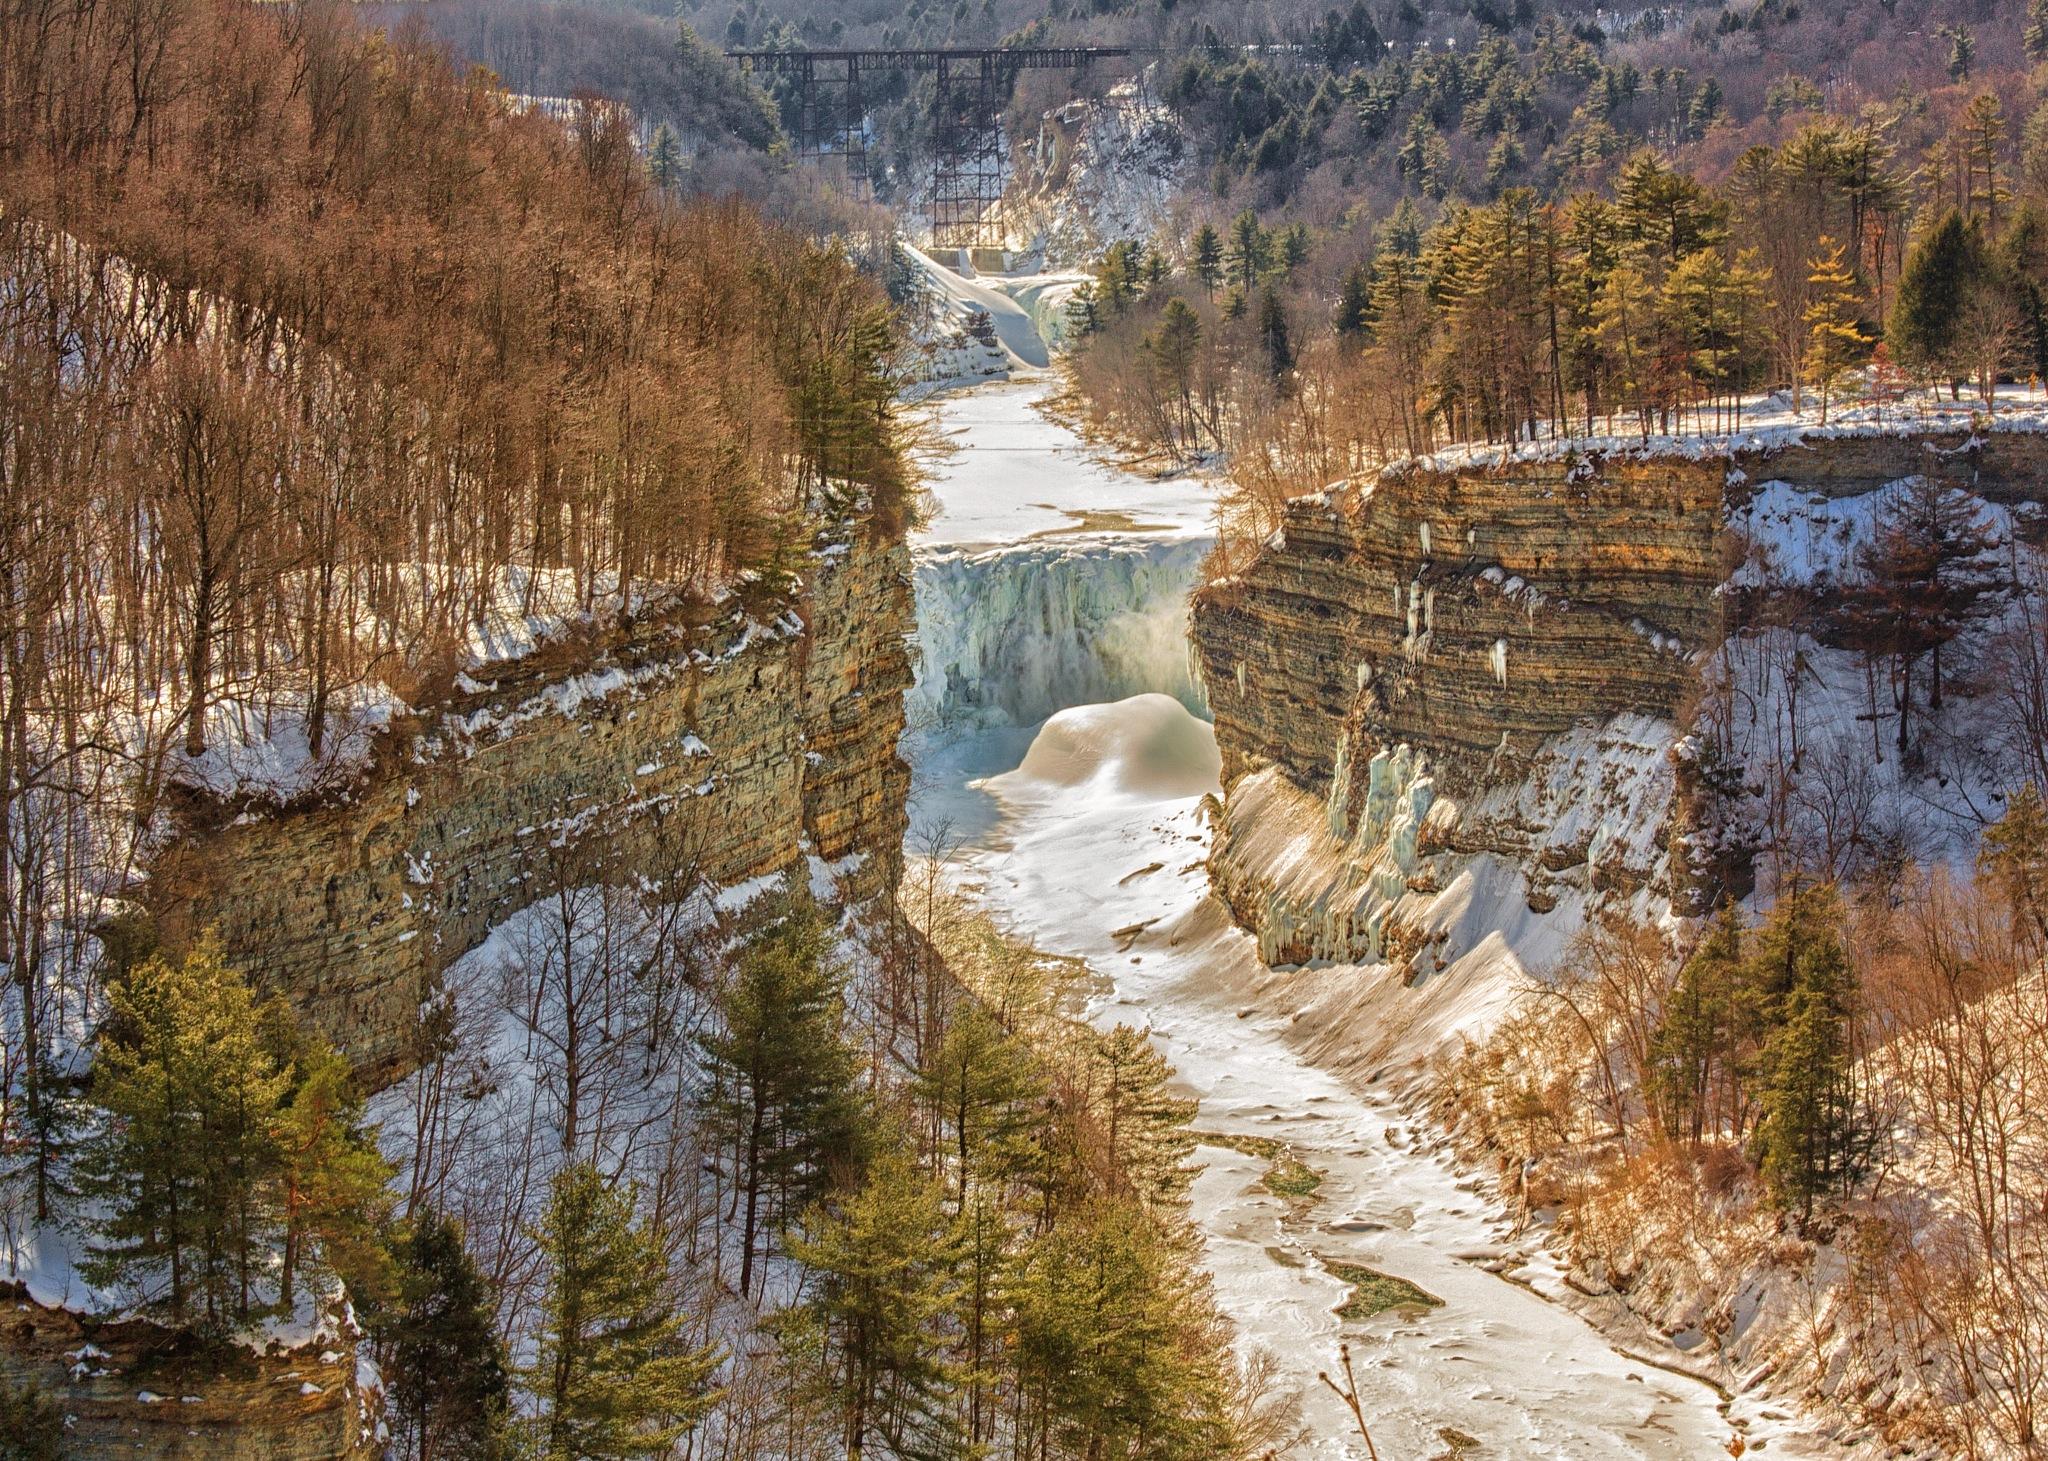 Frozen River Gorge by JackieandTom Daunce